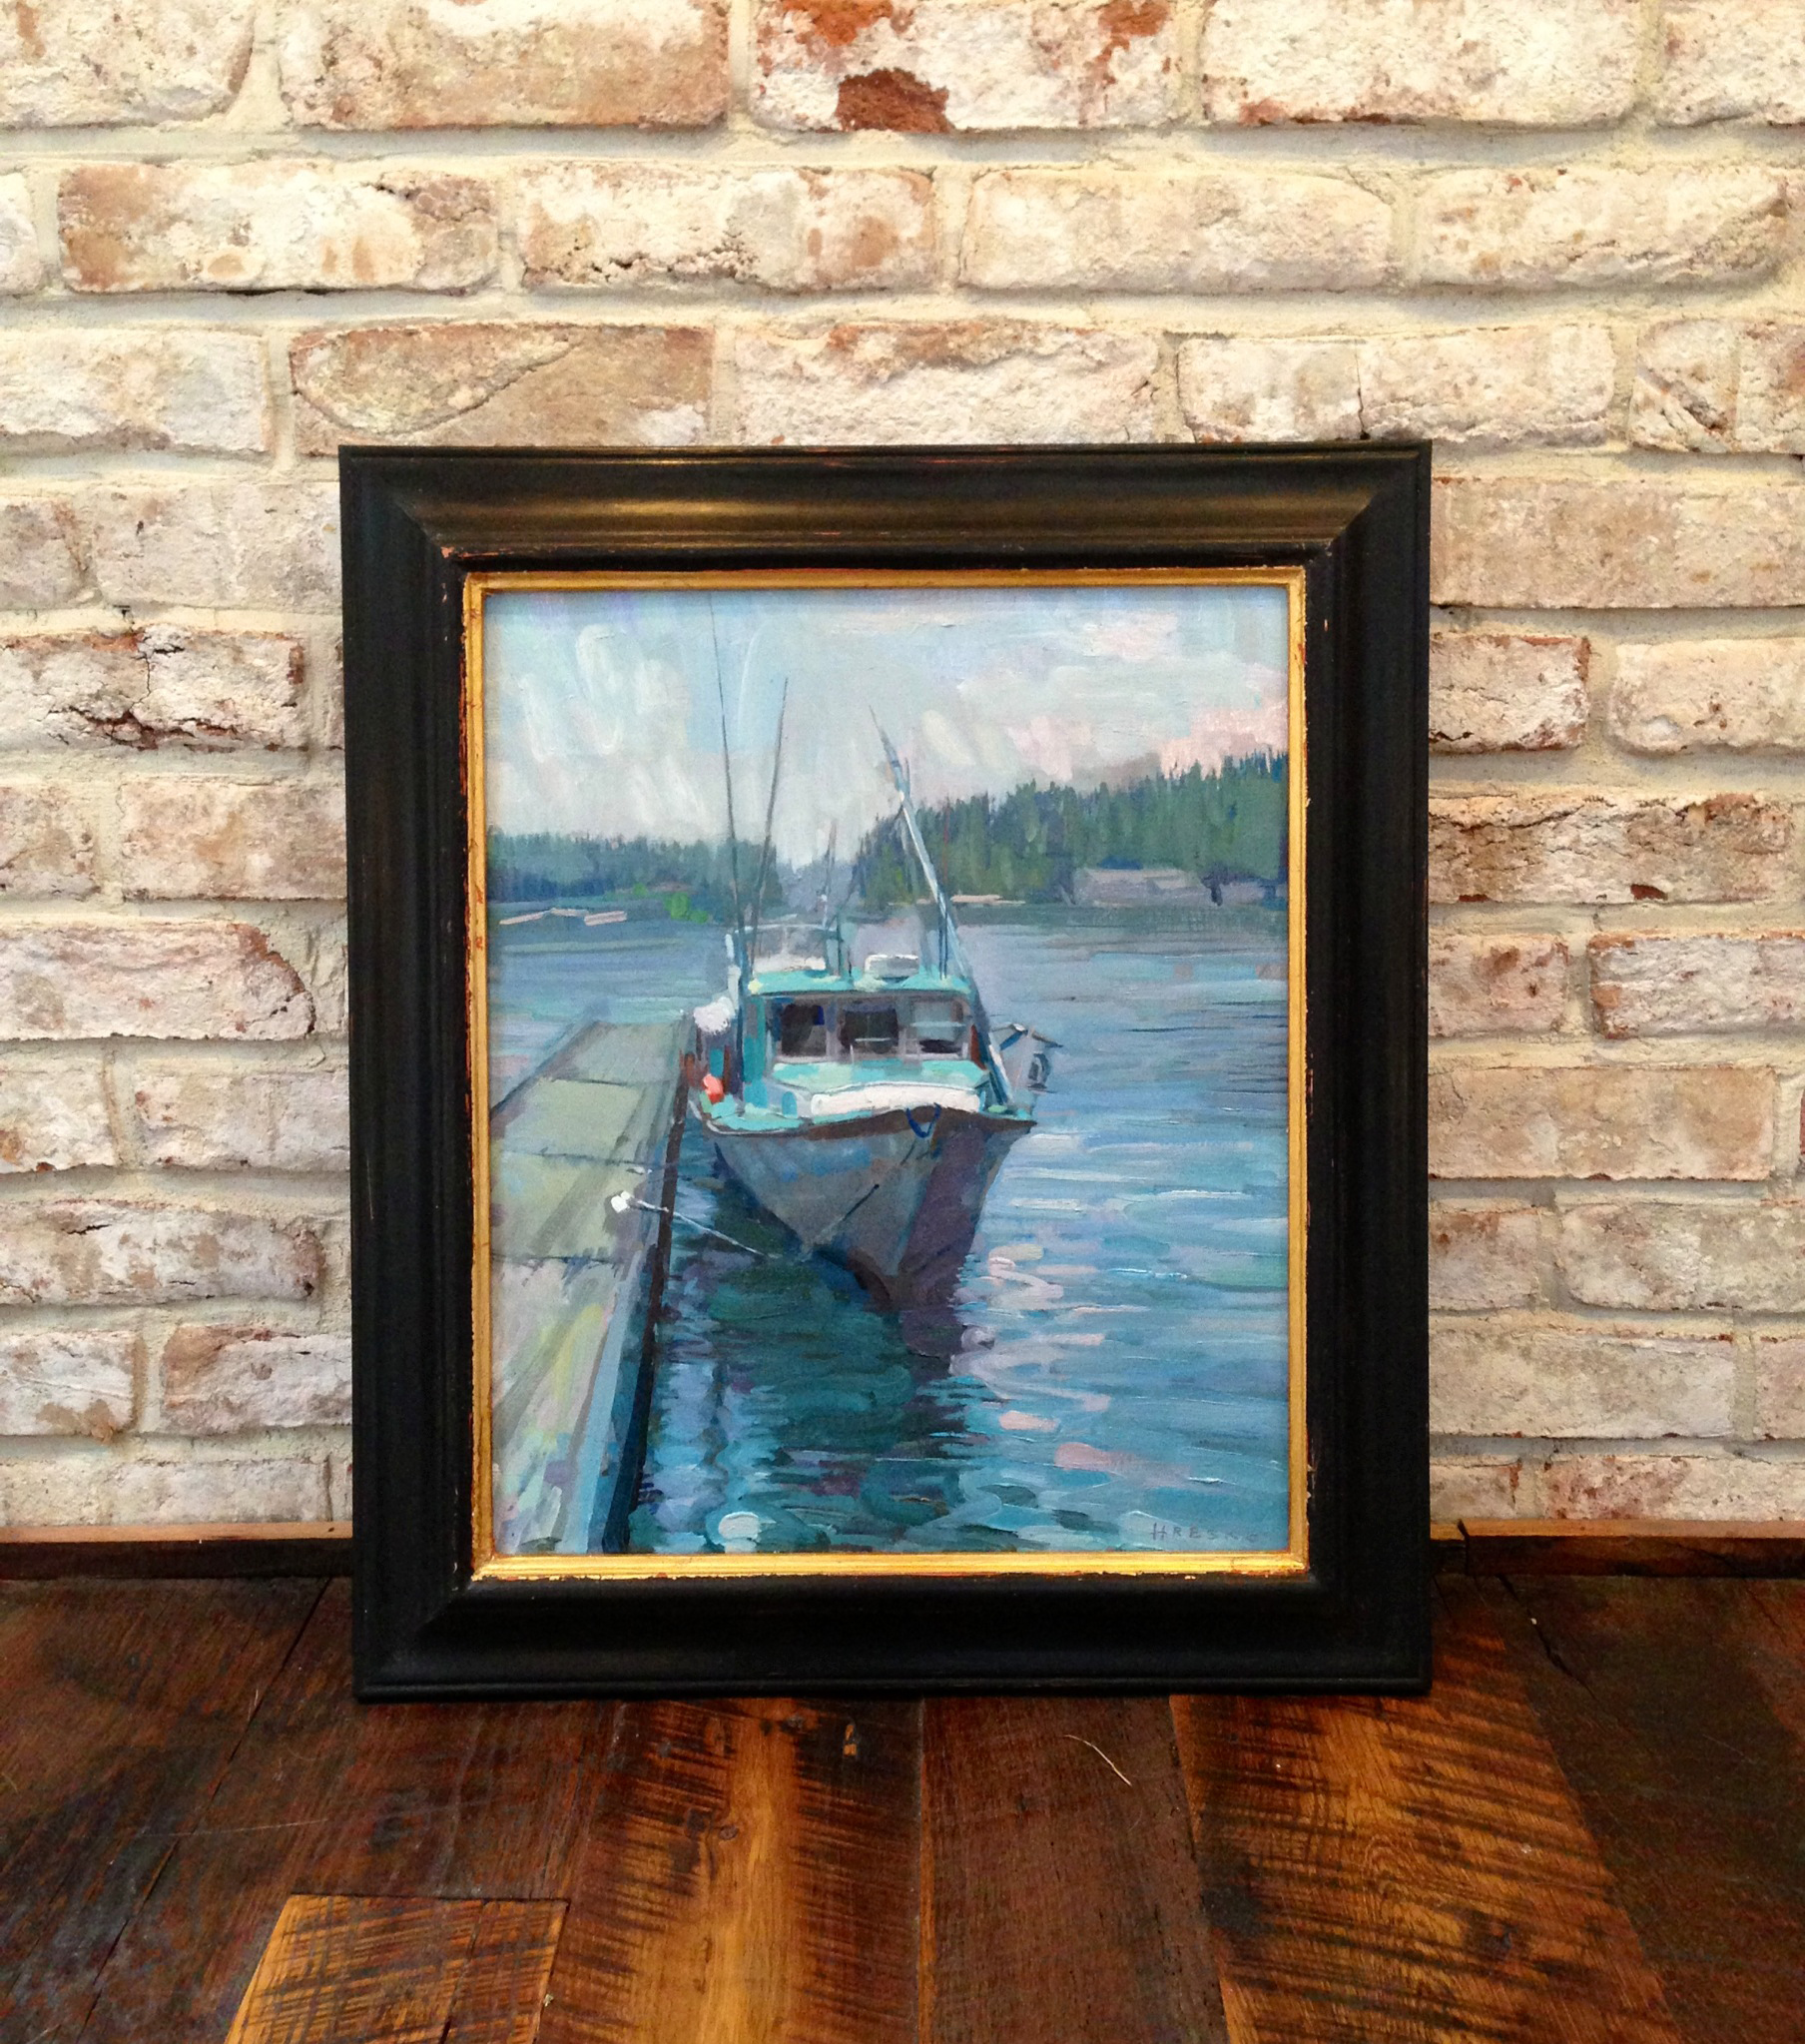 'Marjorie, Stonington' Framed